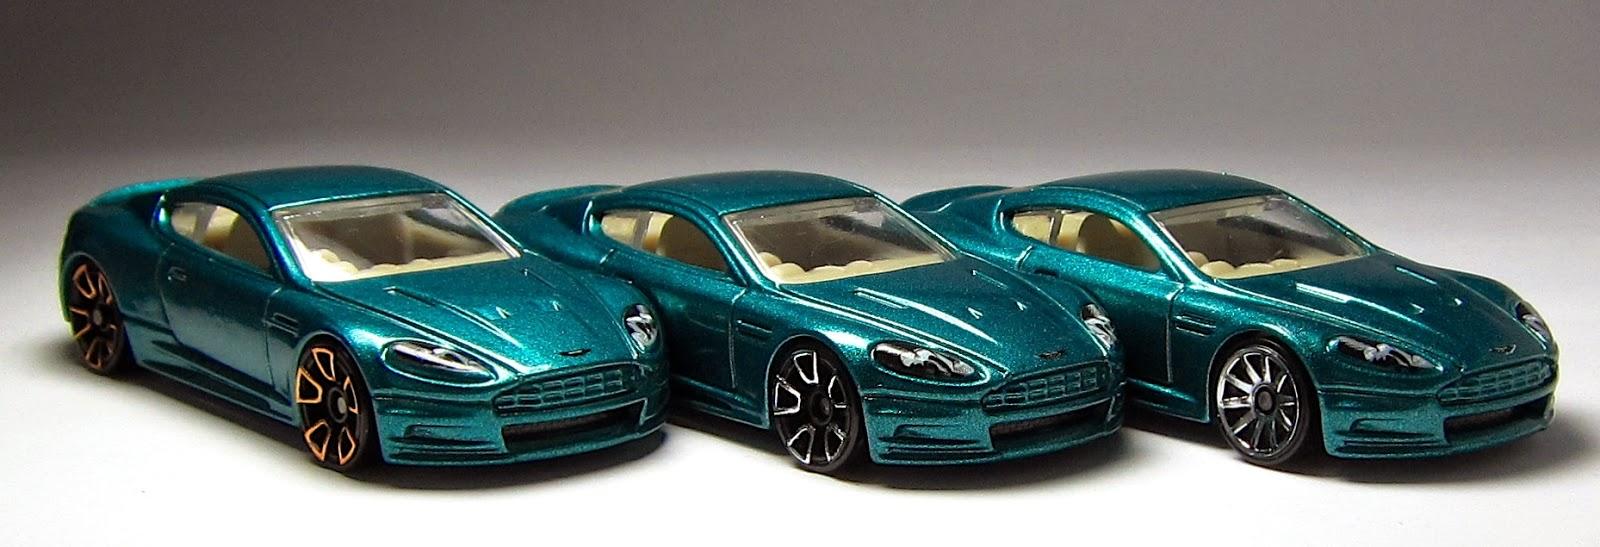 A Complete Look Hot Wheels Aston Martin Dbs Lamleygroup